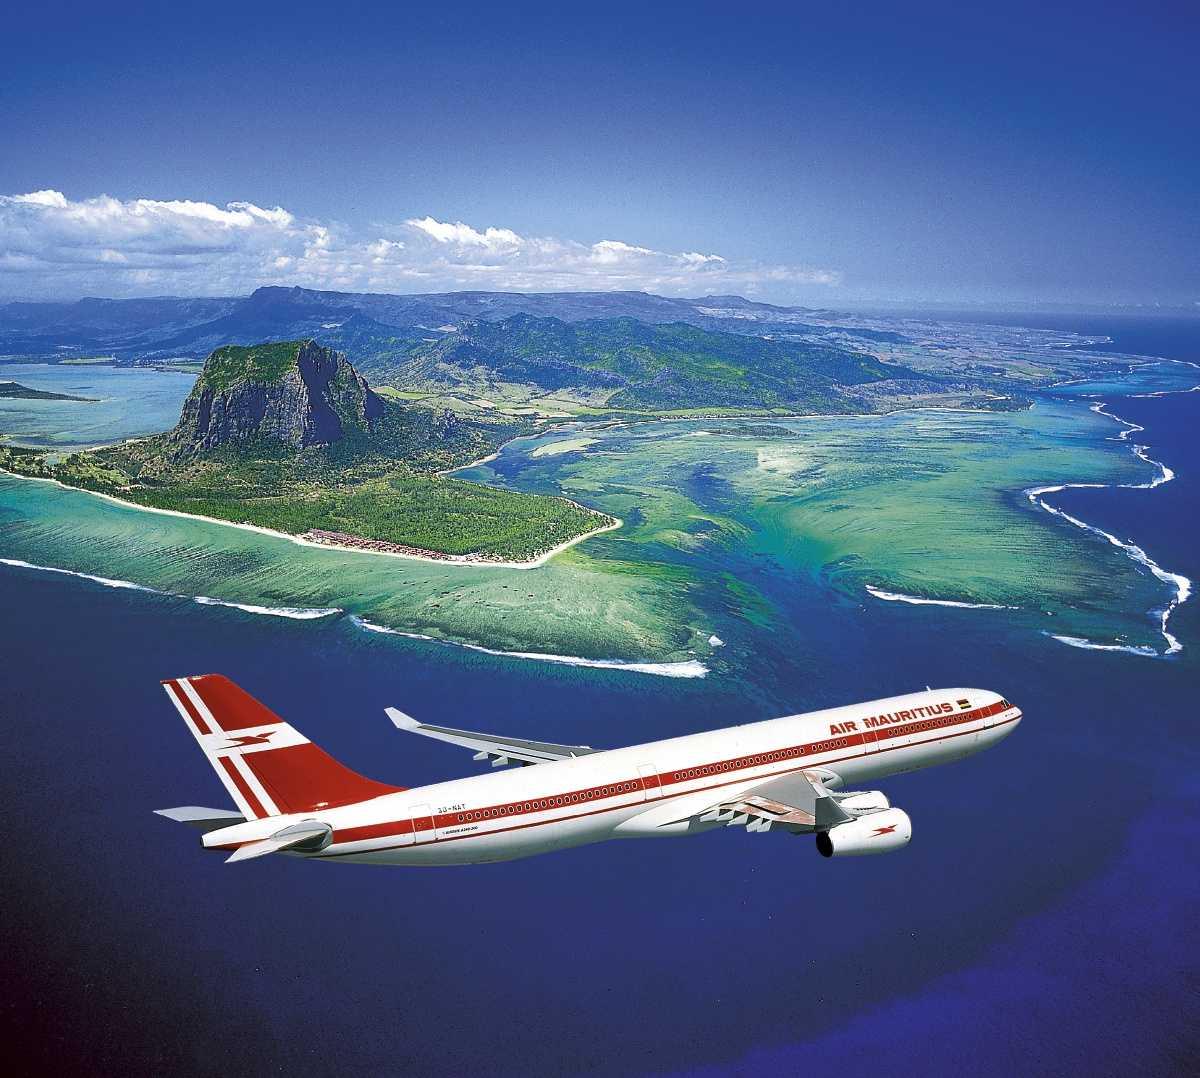 http://2.bp.blogspot.com/-5ojubnY-QXQ/T3WOt0ejz5I/AAAAAAAAFgQ/A7zhQS_1CQk/s1600/Air_Mauritius_Mauritius_Tourism.jpg